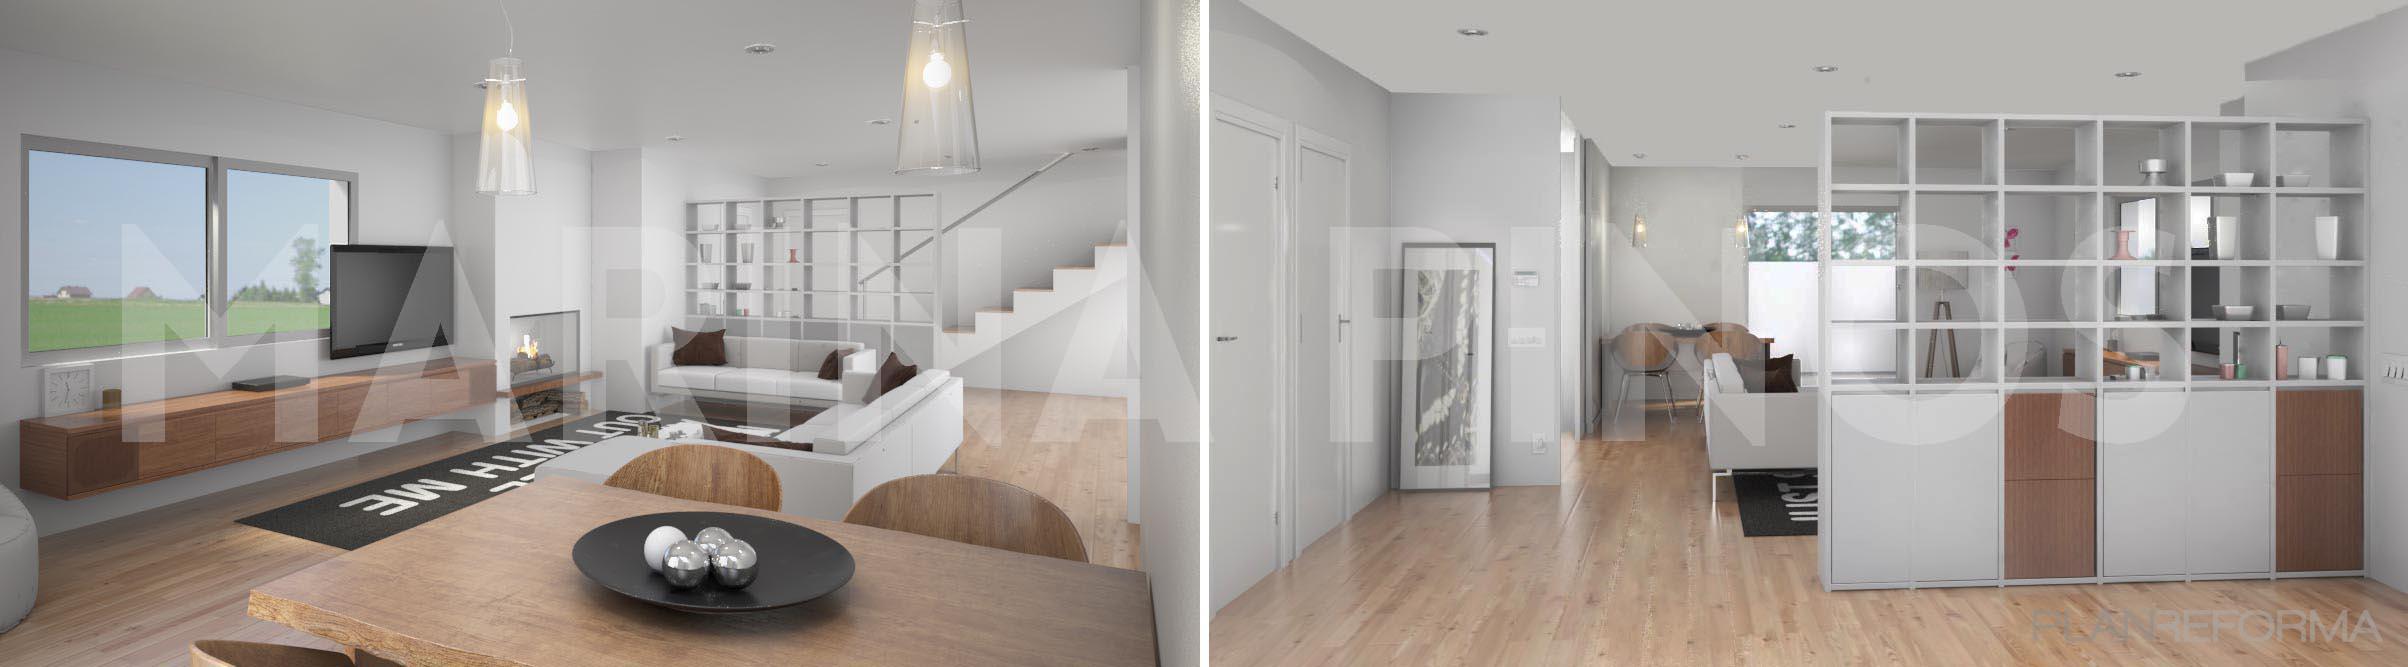 Comedor sala de la tv escalera estilo moderno color for Comedor gris moderno